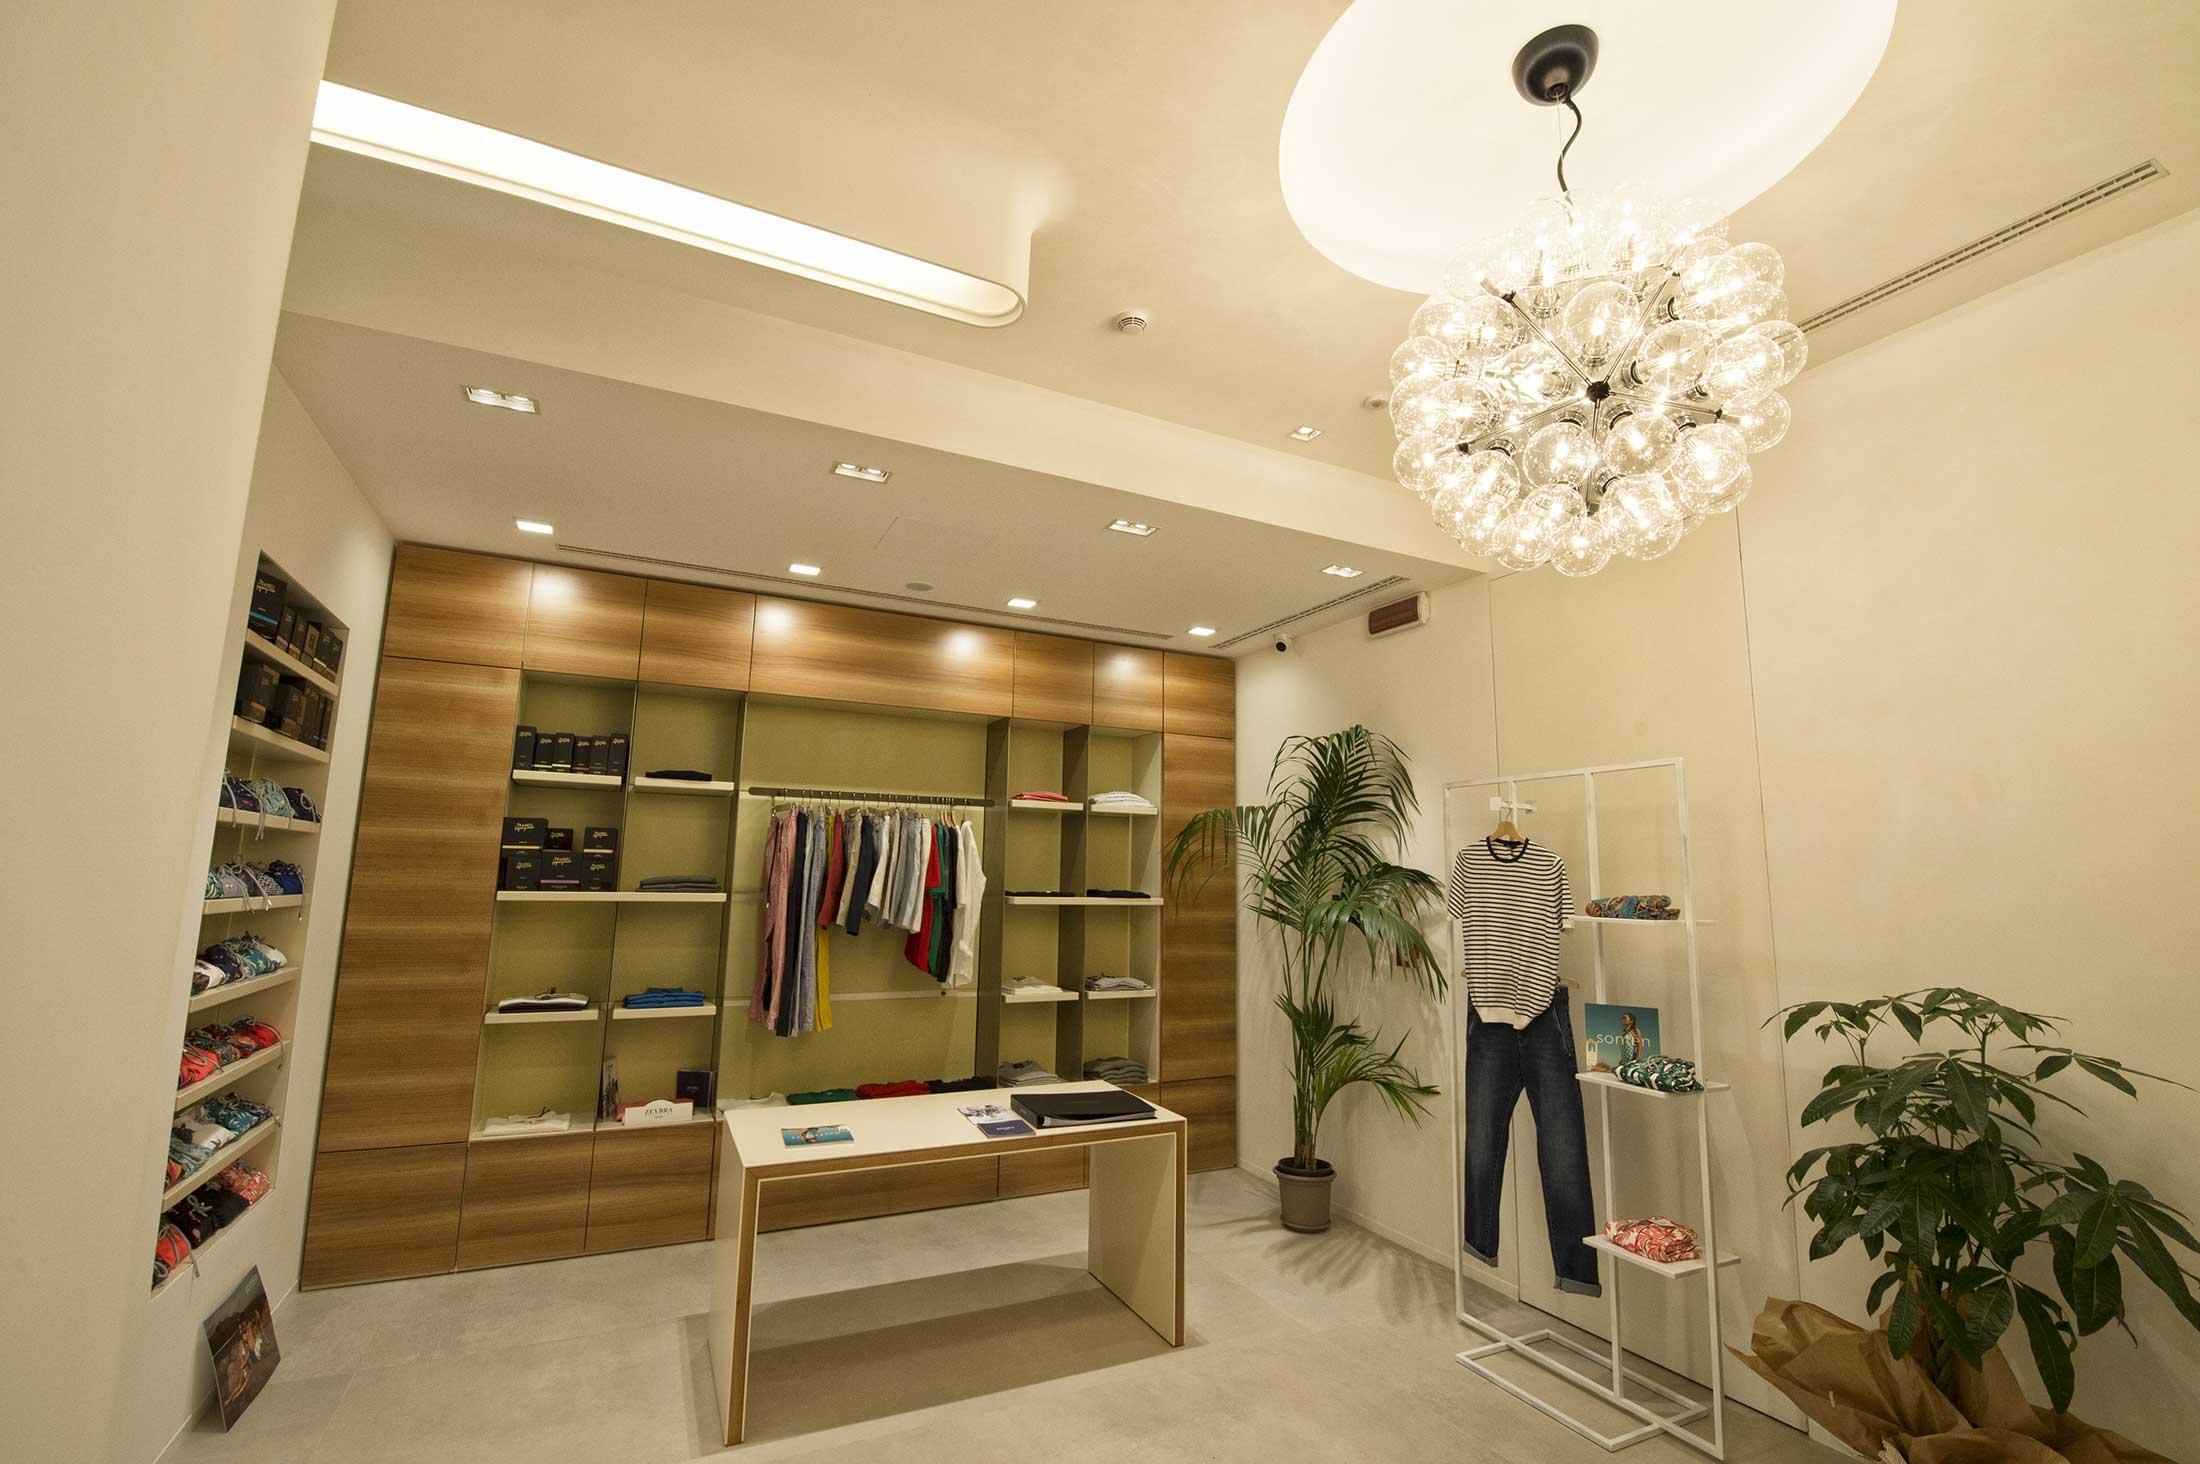 Opposti-Boutique-Addessi-Solutions (9)